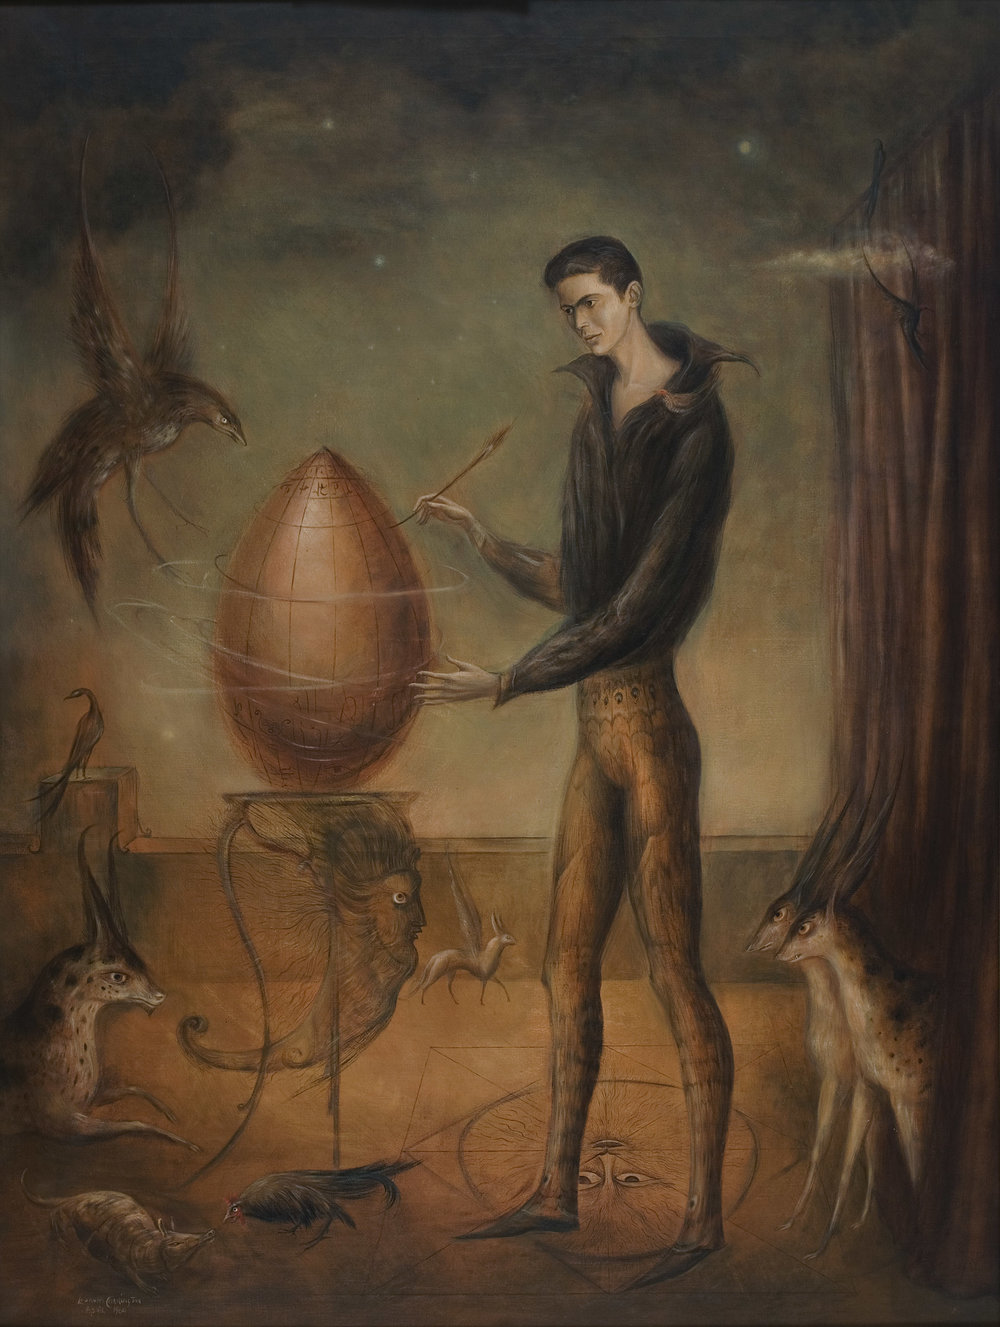 Leonora Carrington,  Quería ser pájaro , 1960, Oil on canvas, 47 x 35.5 inches (119 x 90 cm), © 2019 Estate of Leonora Carrington / Artists Rights Society (ARS), New York